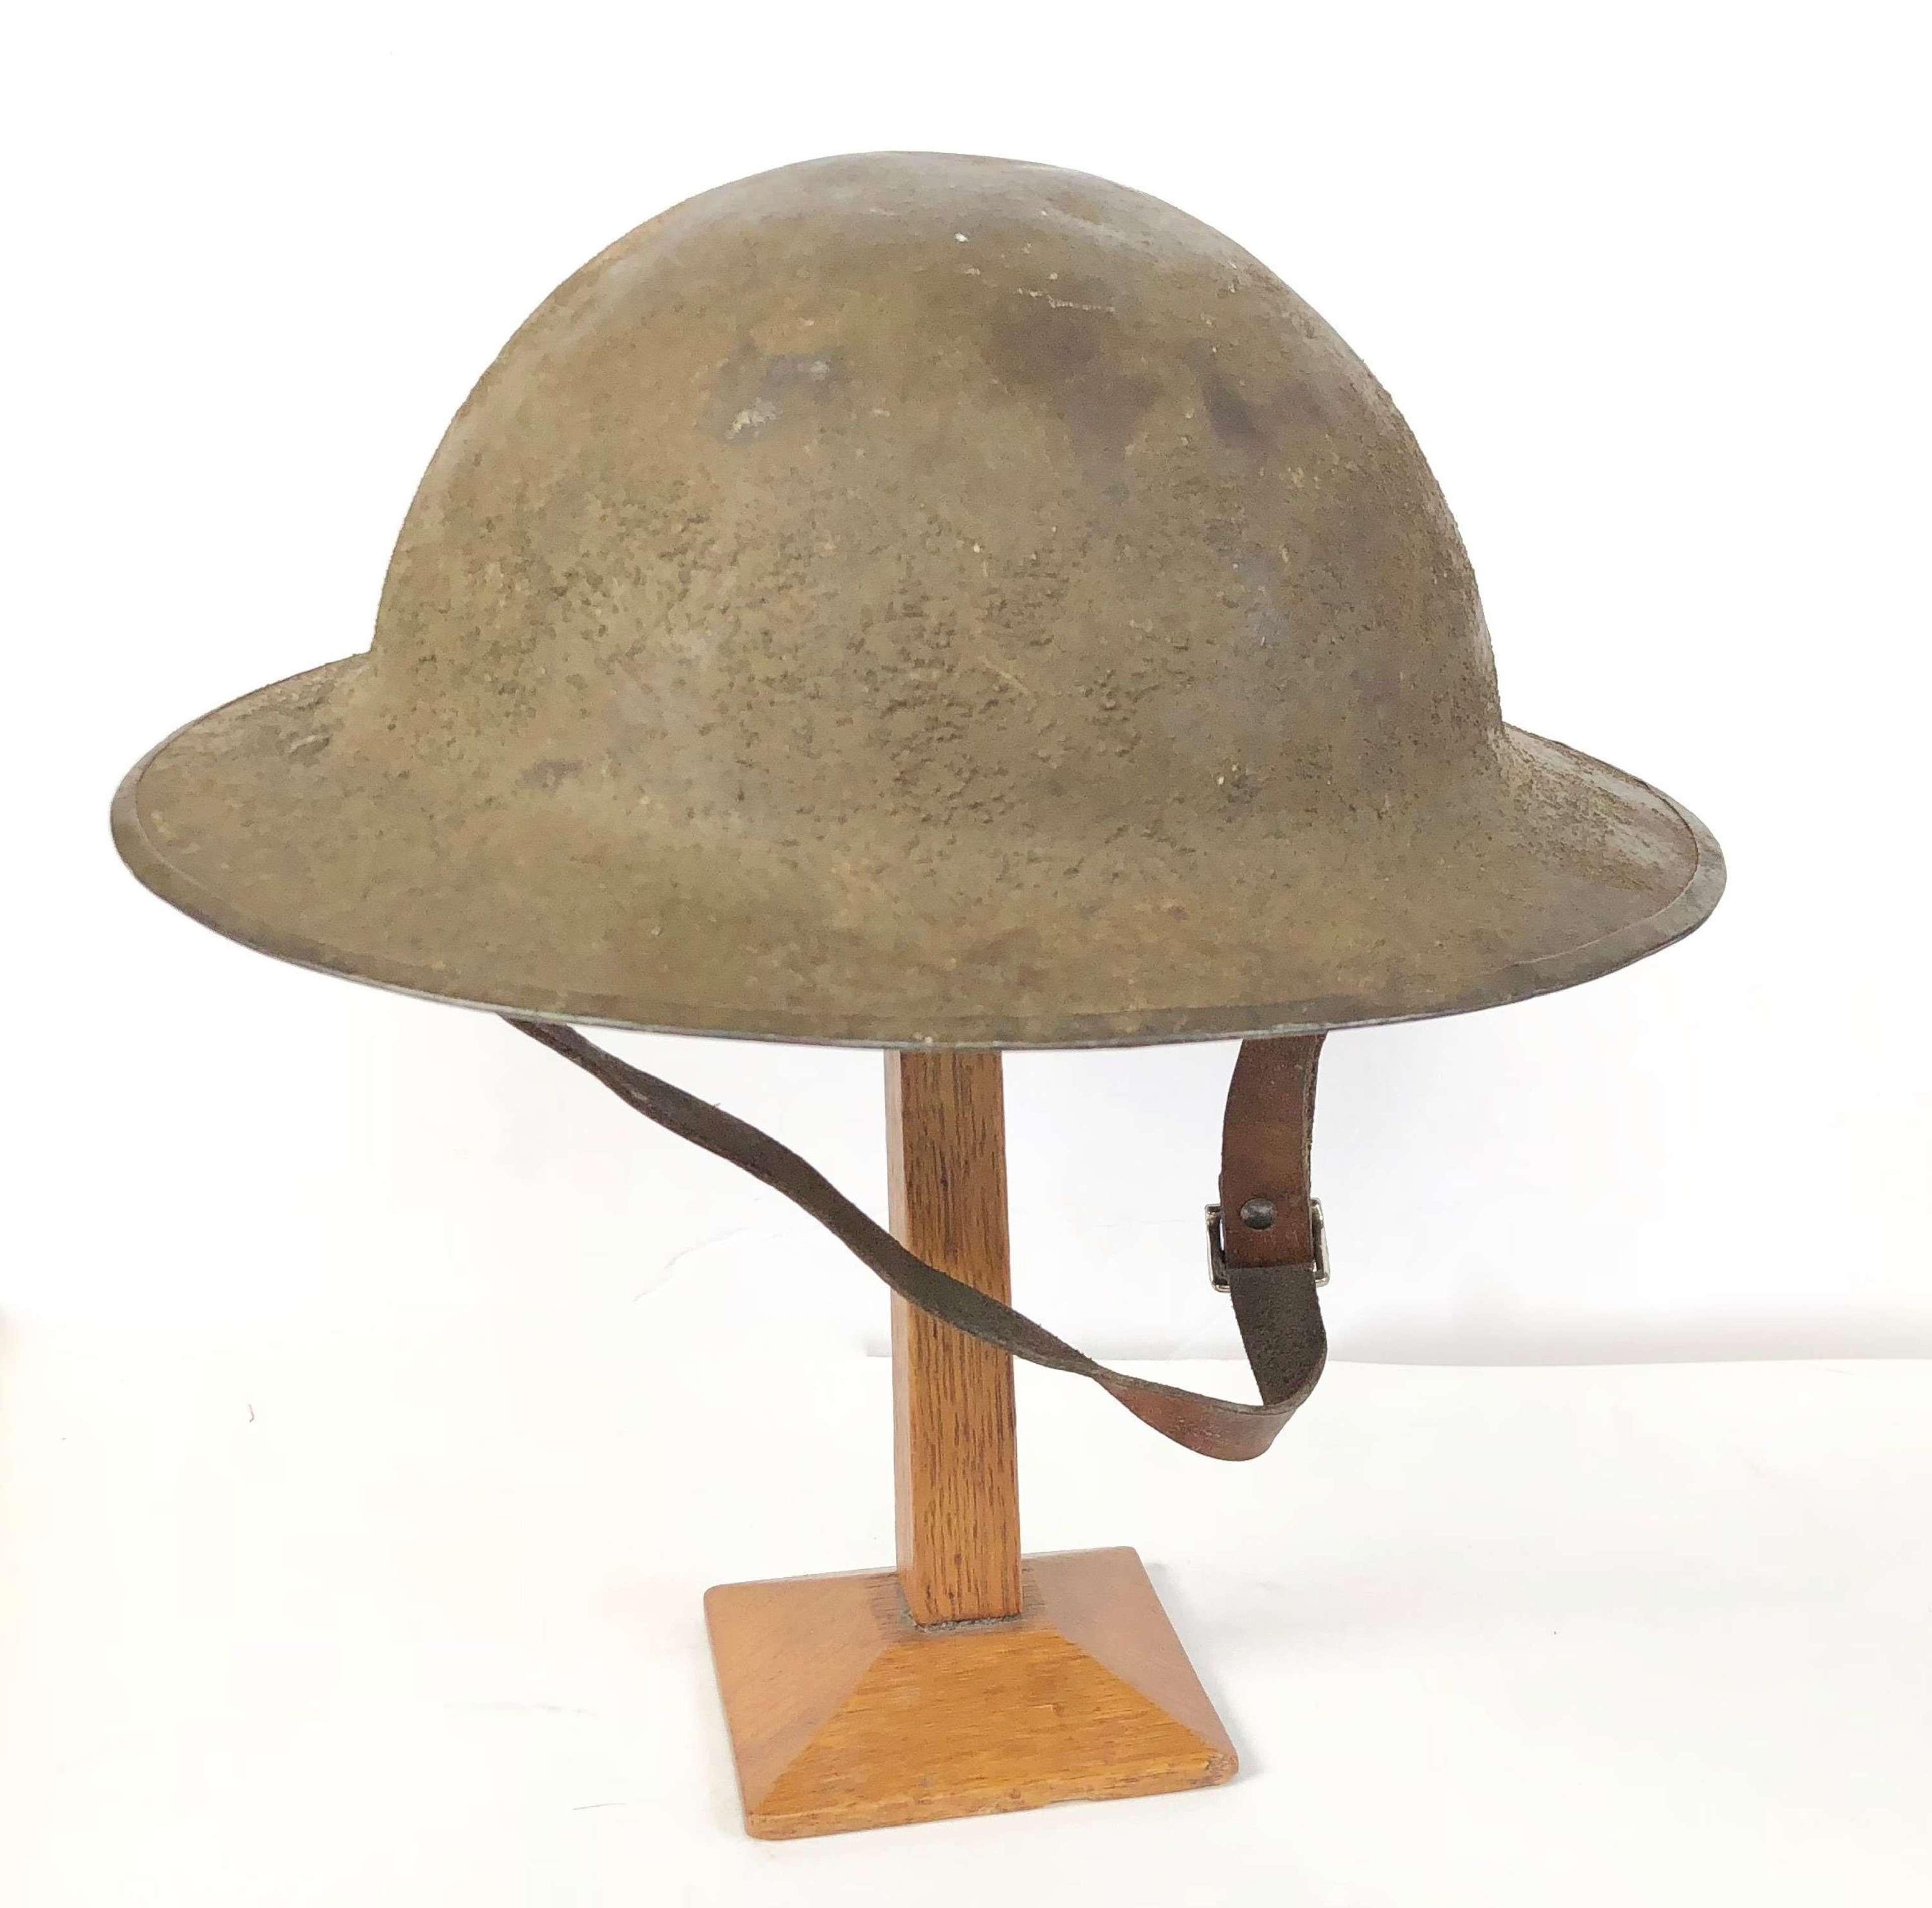 WW1 Period British Army Brodie Steel Helmet.